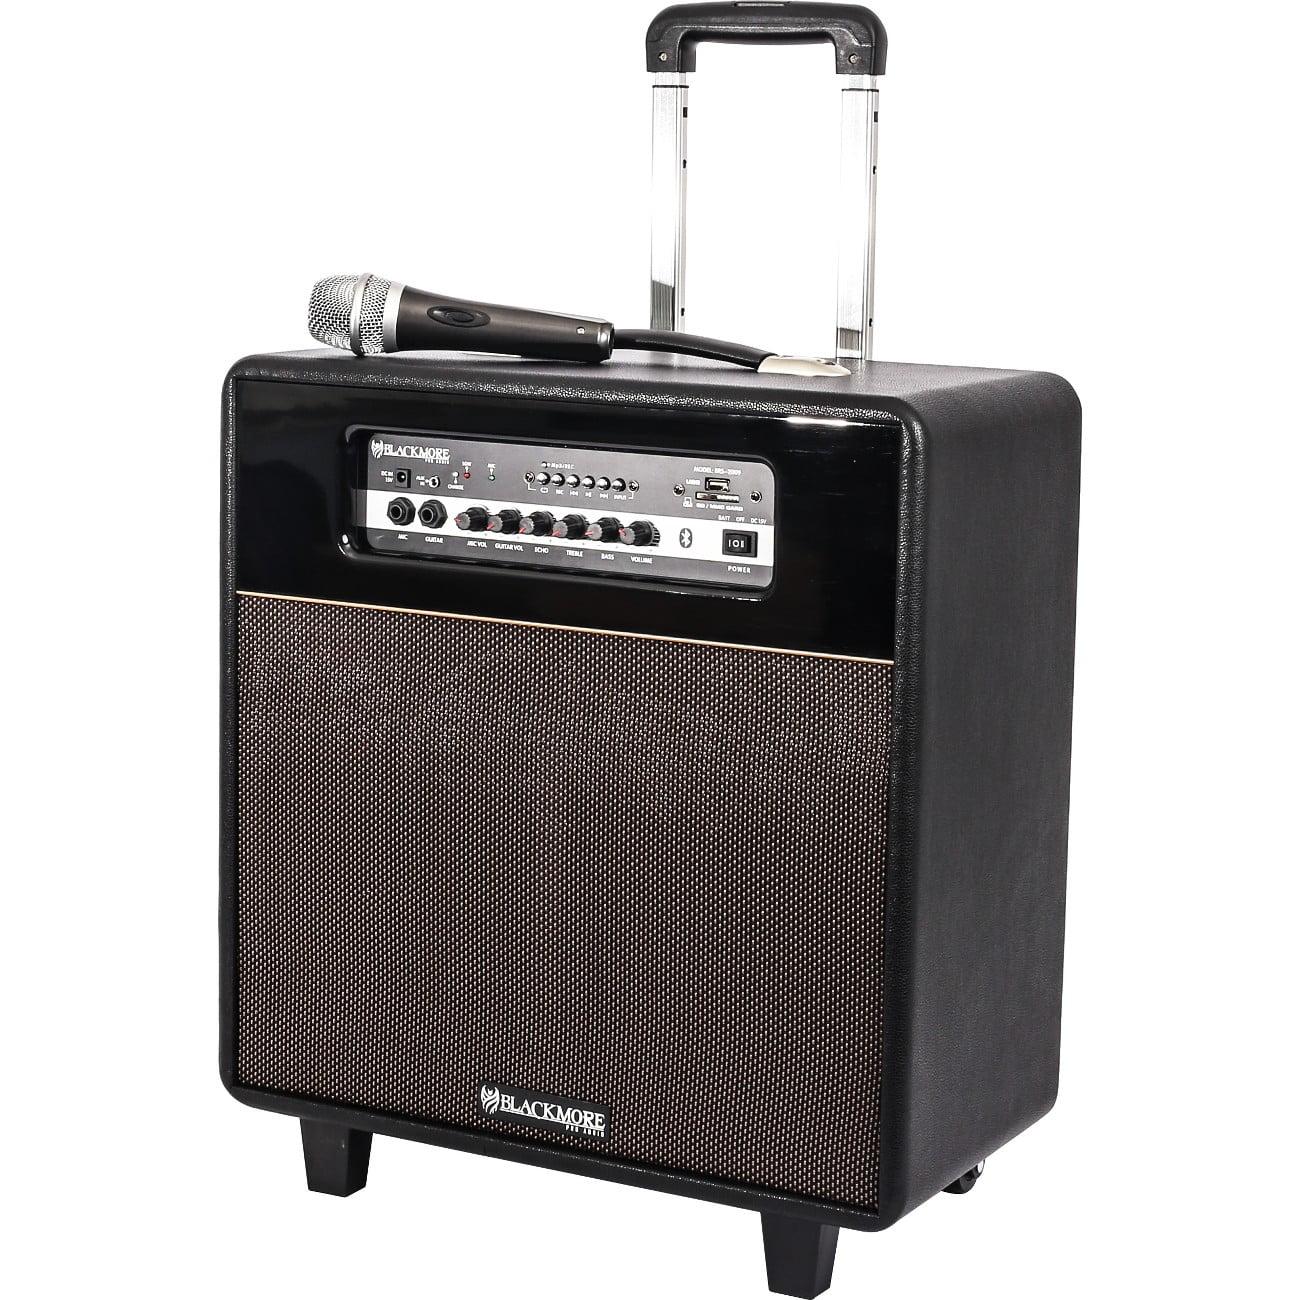 Samson BRS-2009 Bluetooth Instrument Amplifier Spkr Rechargeable Mp3 Player Portable